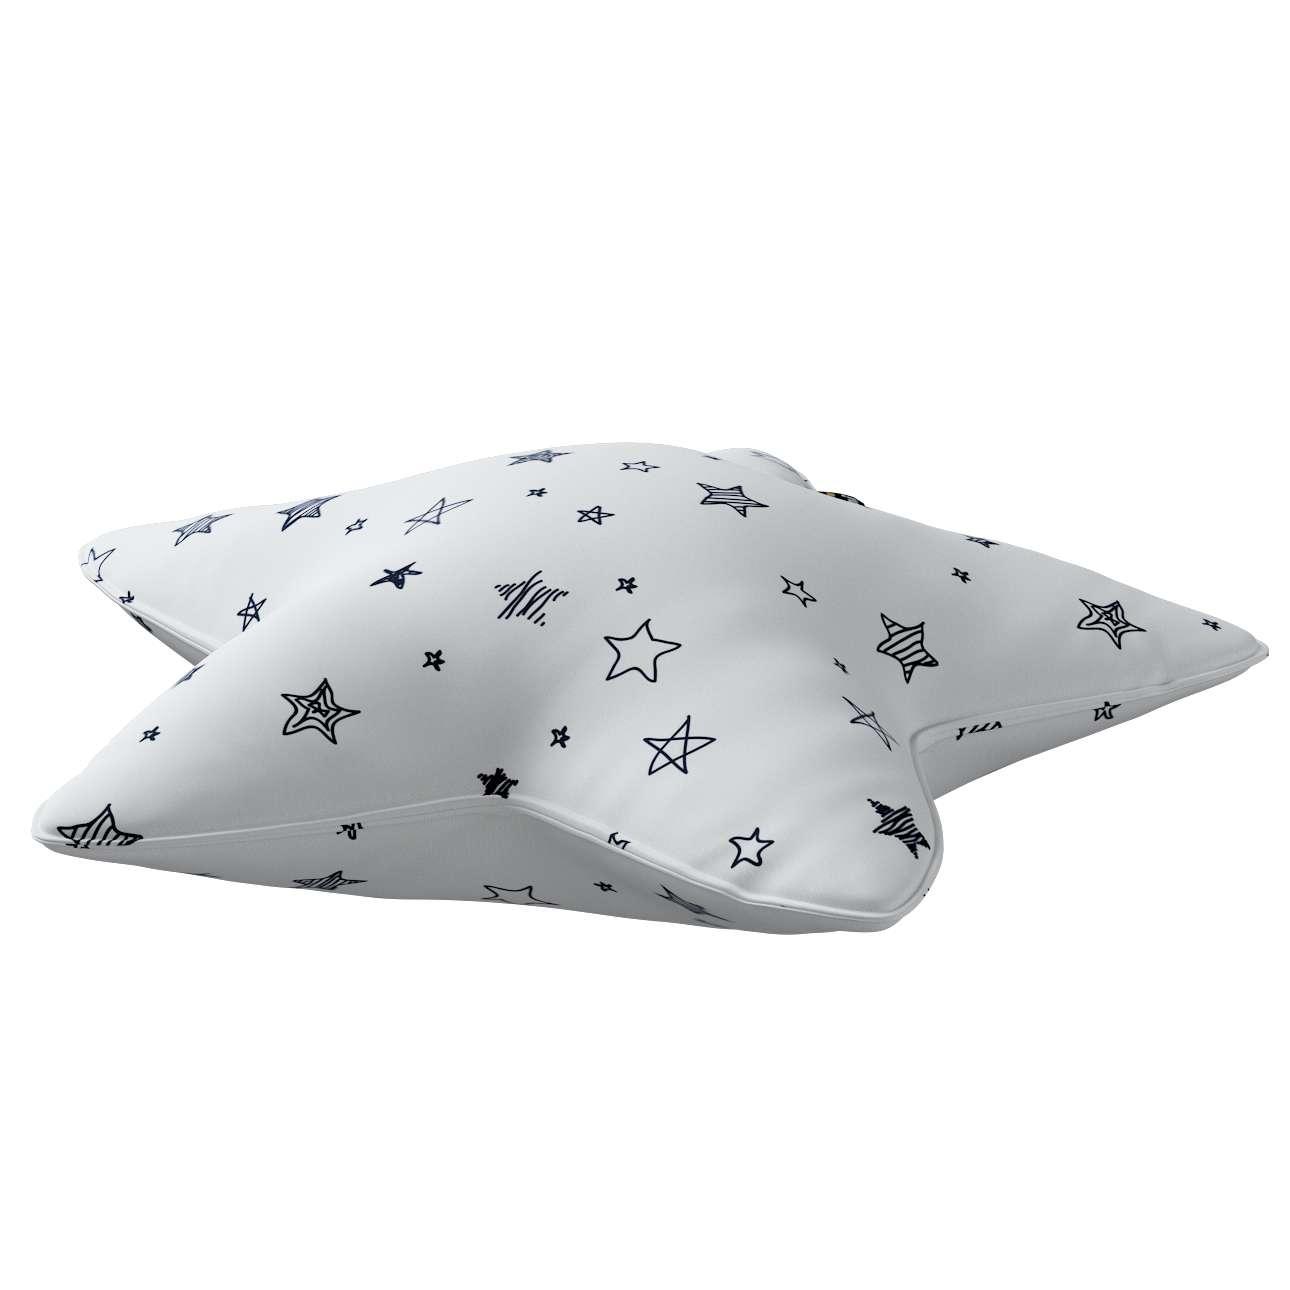 Lucky Star pagalvėlė kolekcijoje Magic Collection, audinys: 500-08